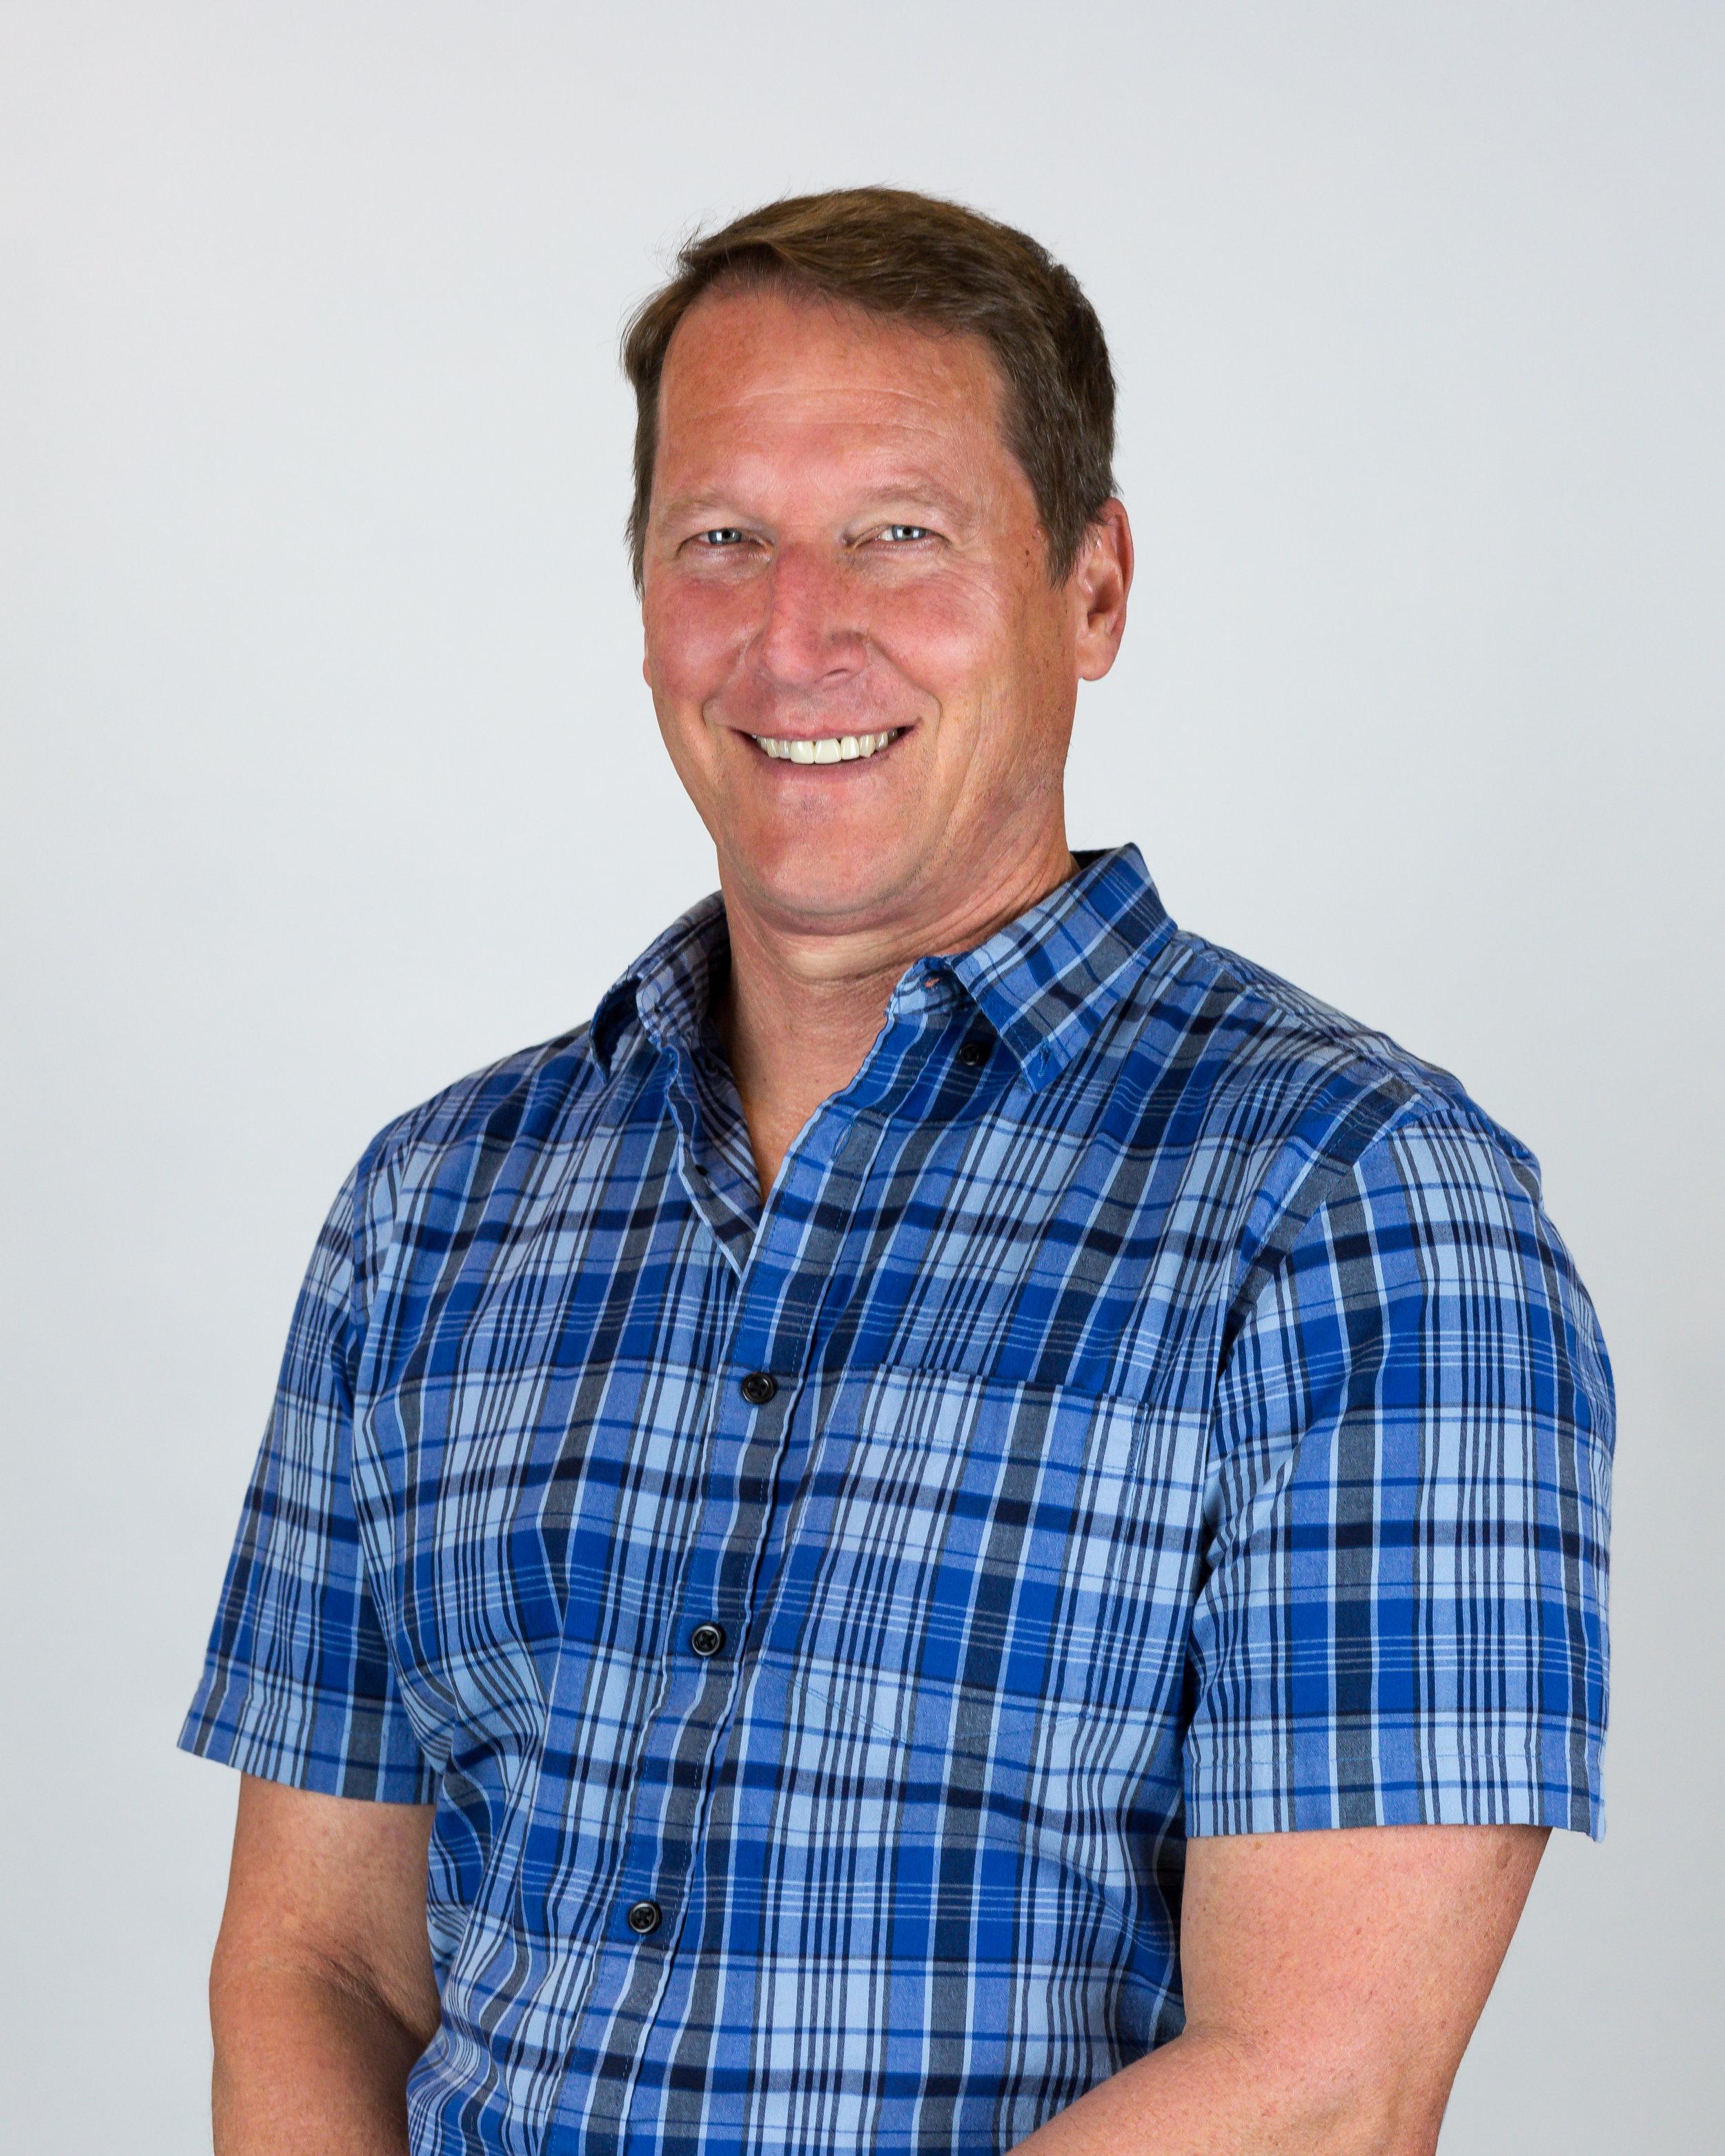 Dave Roberts: Maintenance Director